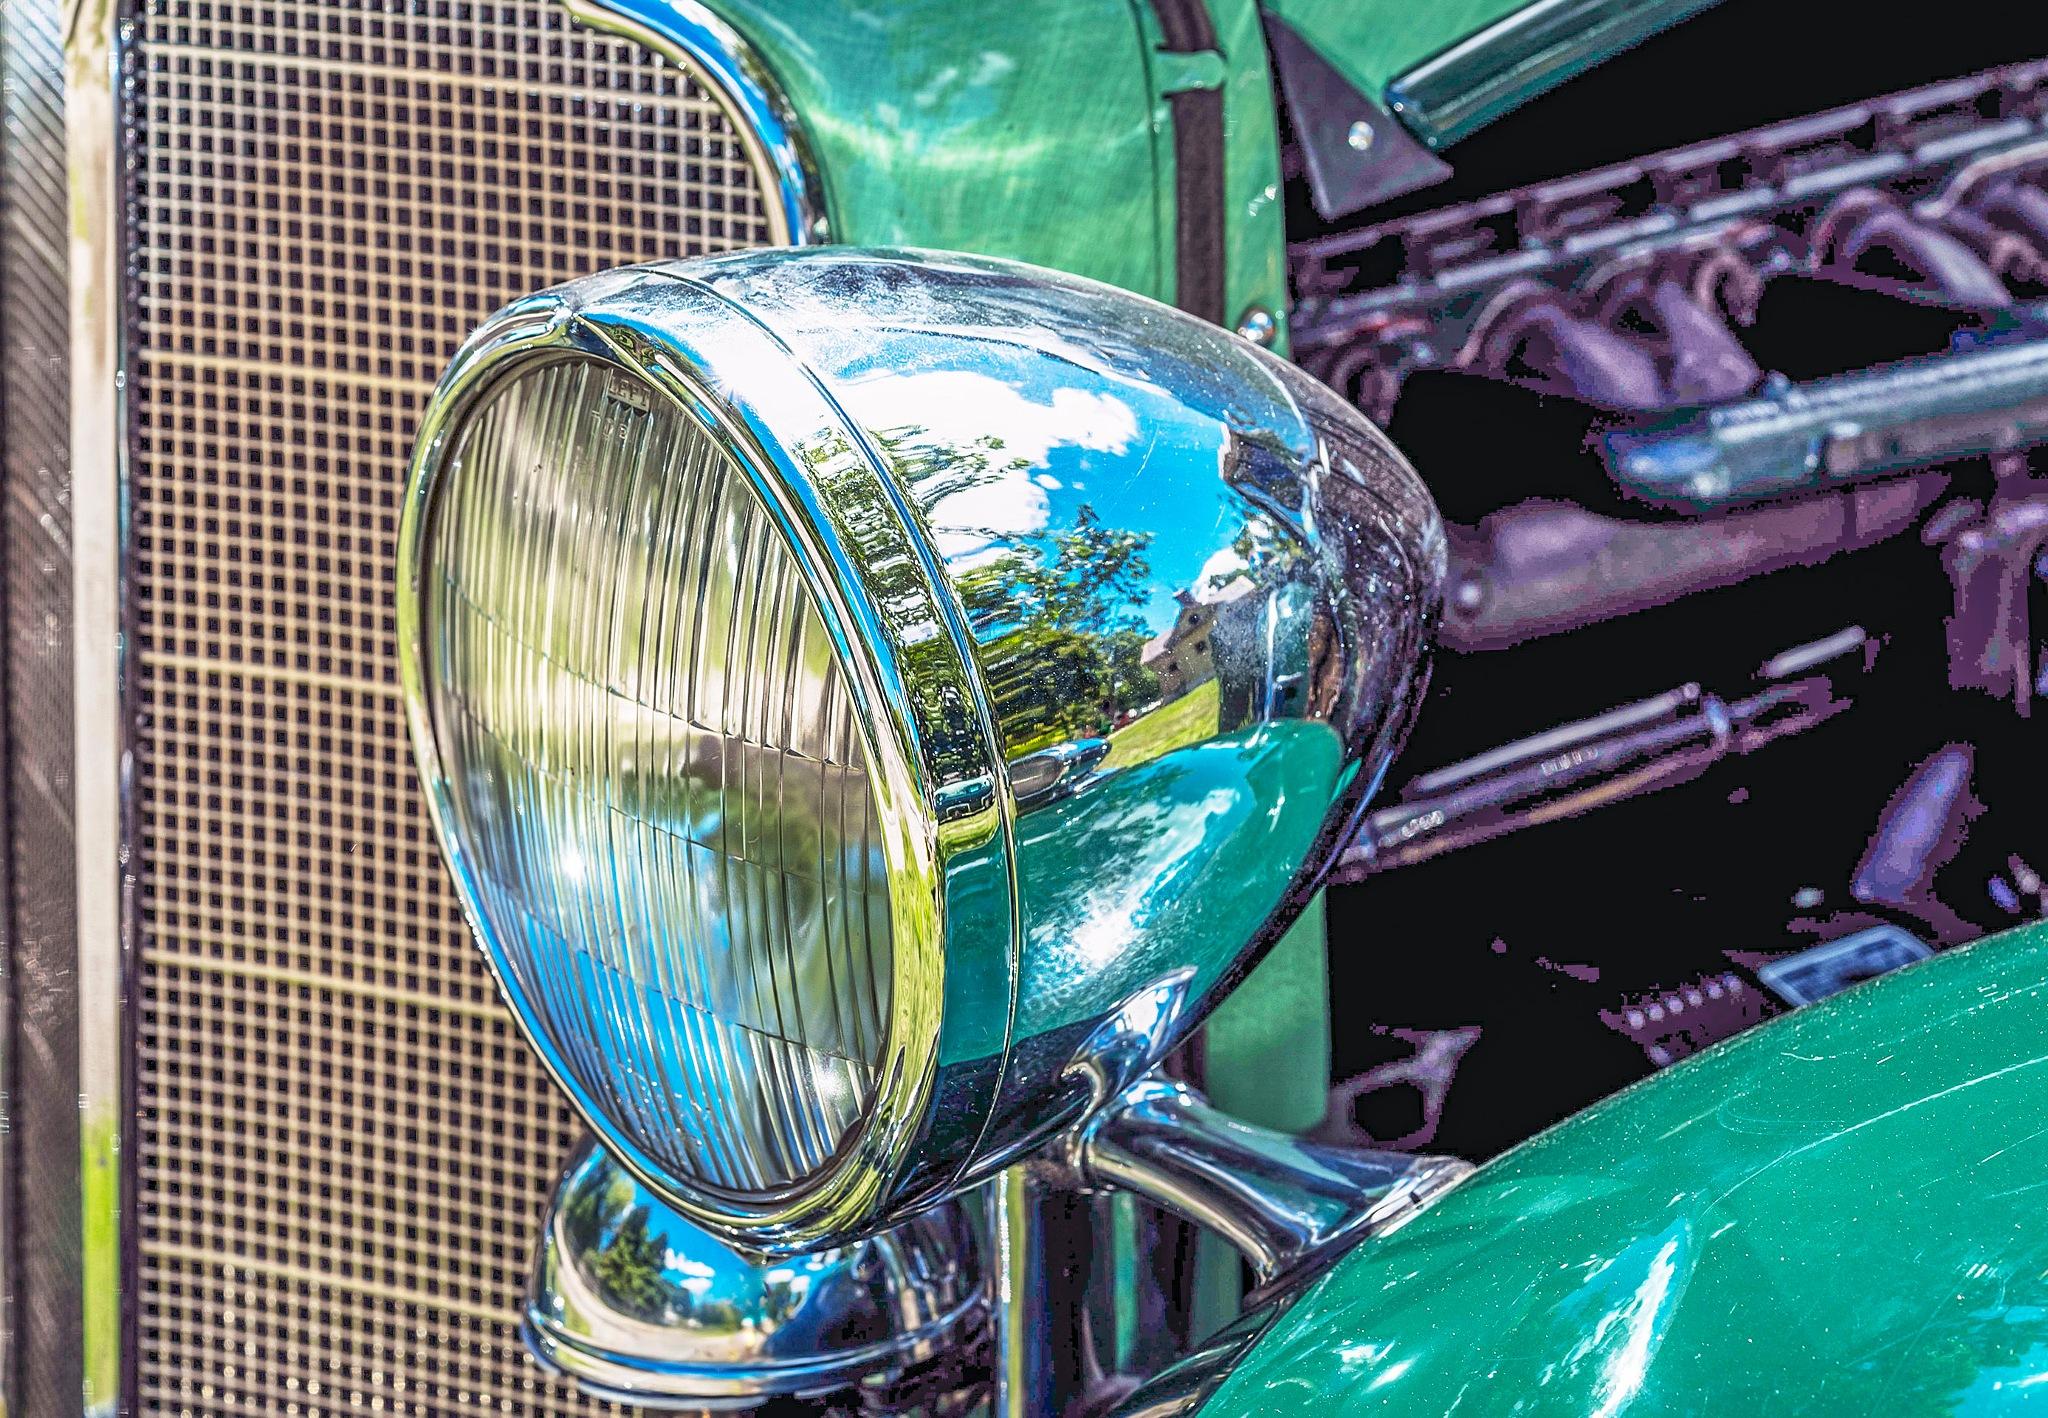 Photo in Random #classic car #headlight #antique #automobile #car #autos #grill #engine #fender #green #concours #car show #summer #automóvil clásico #automobile classica #automobile classique #klassisches automobil #क्लासिक ऑटोमोबाइल #古典的な自動車 #классический автомобиль #класичний автомобіль #klassisk bil